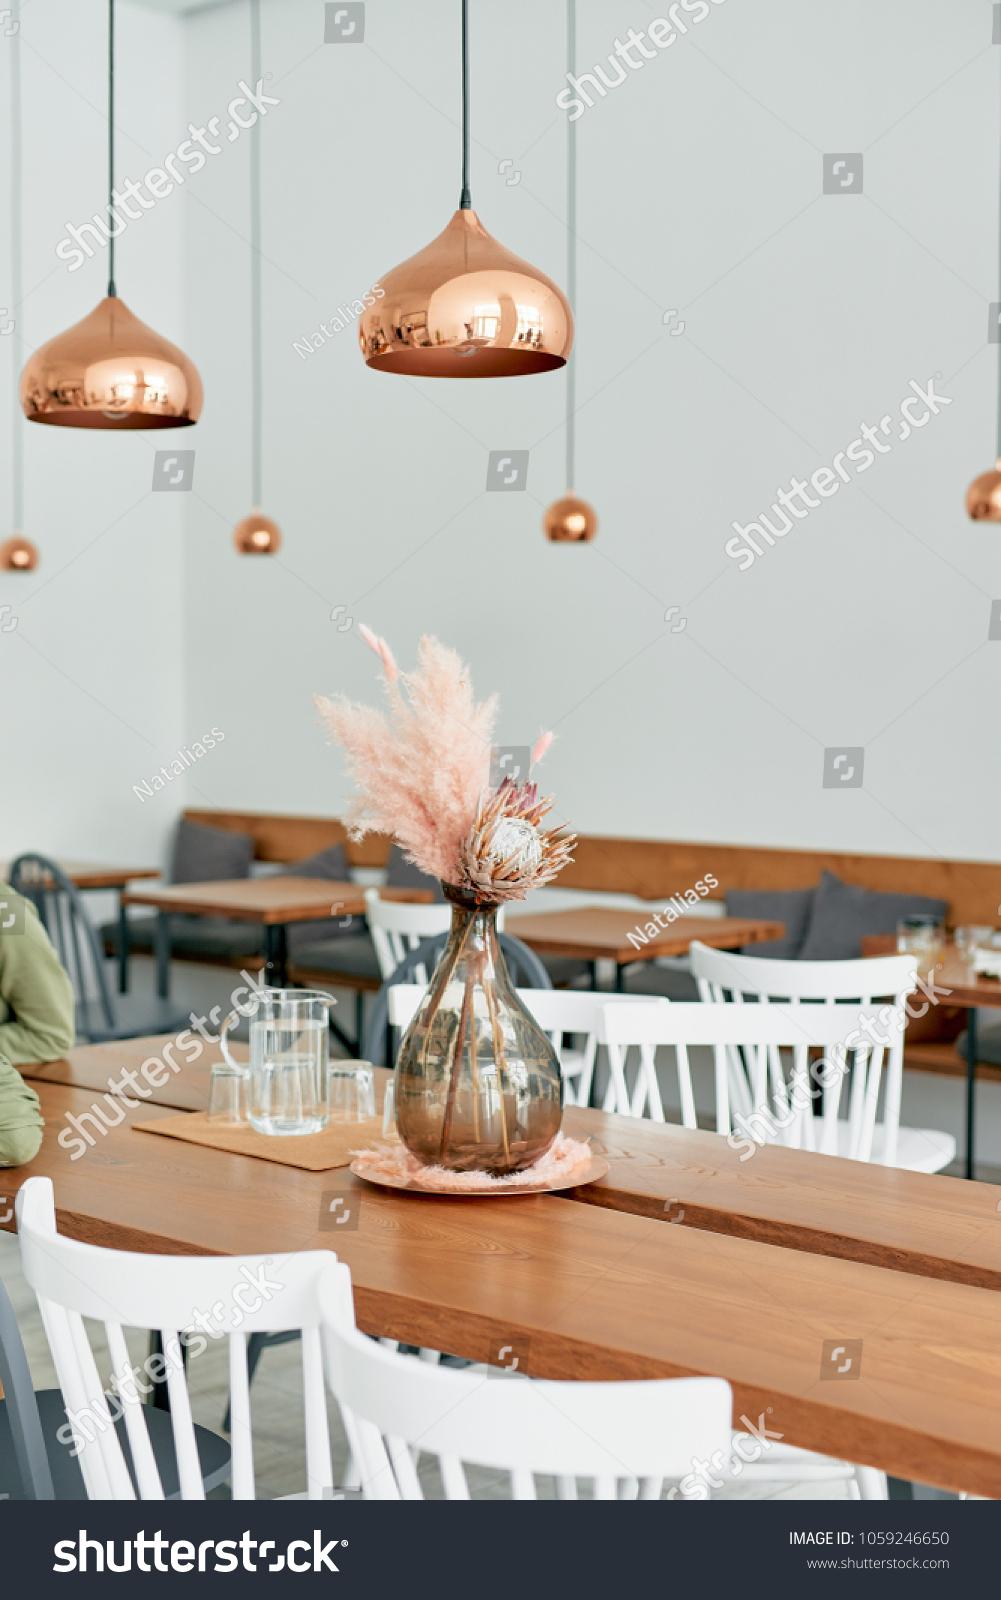 Trendy Modern Cafe Restaurant Light Pastel Stock Photo Edit Now 1059246650